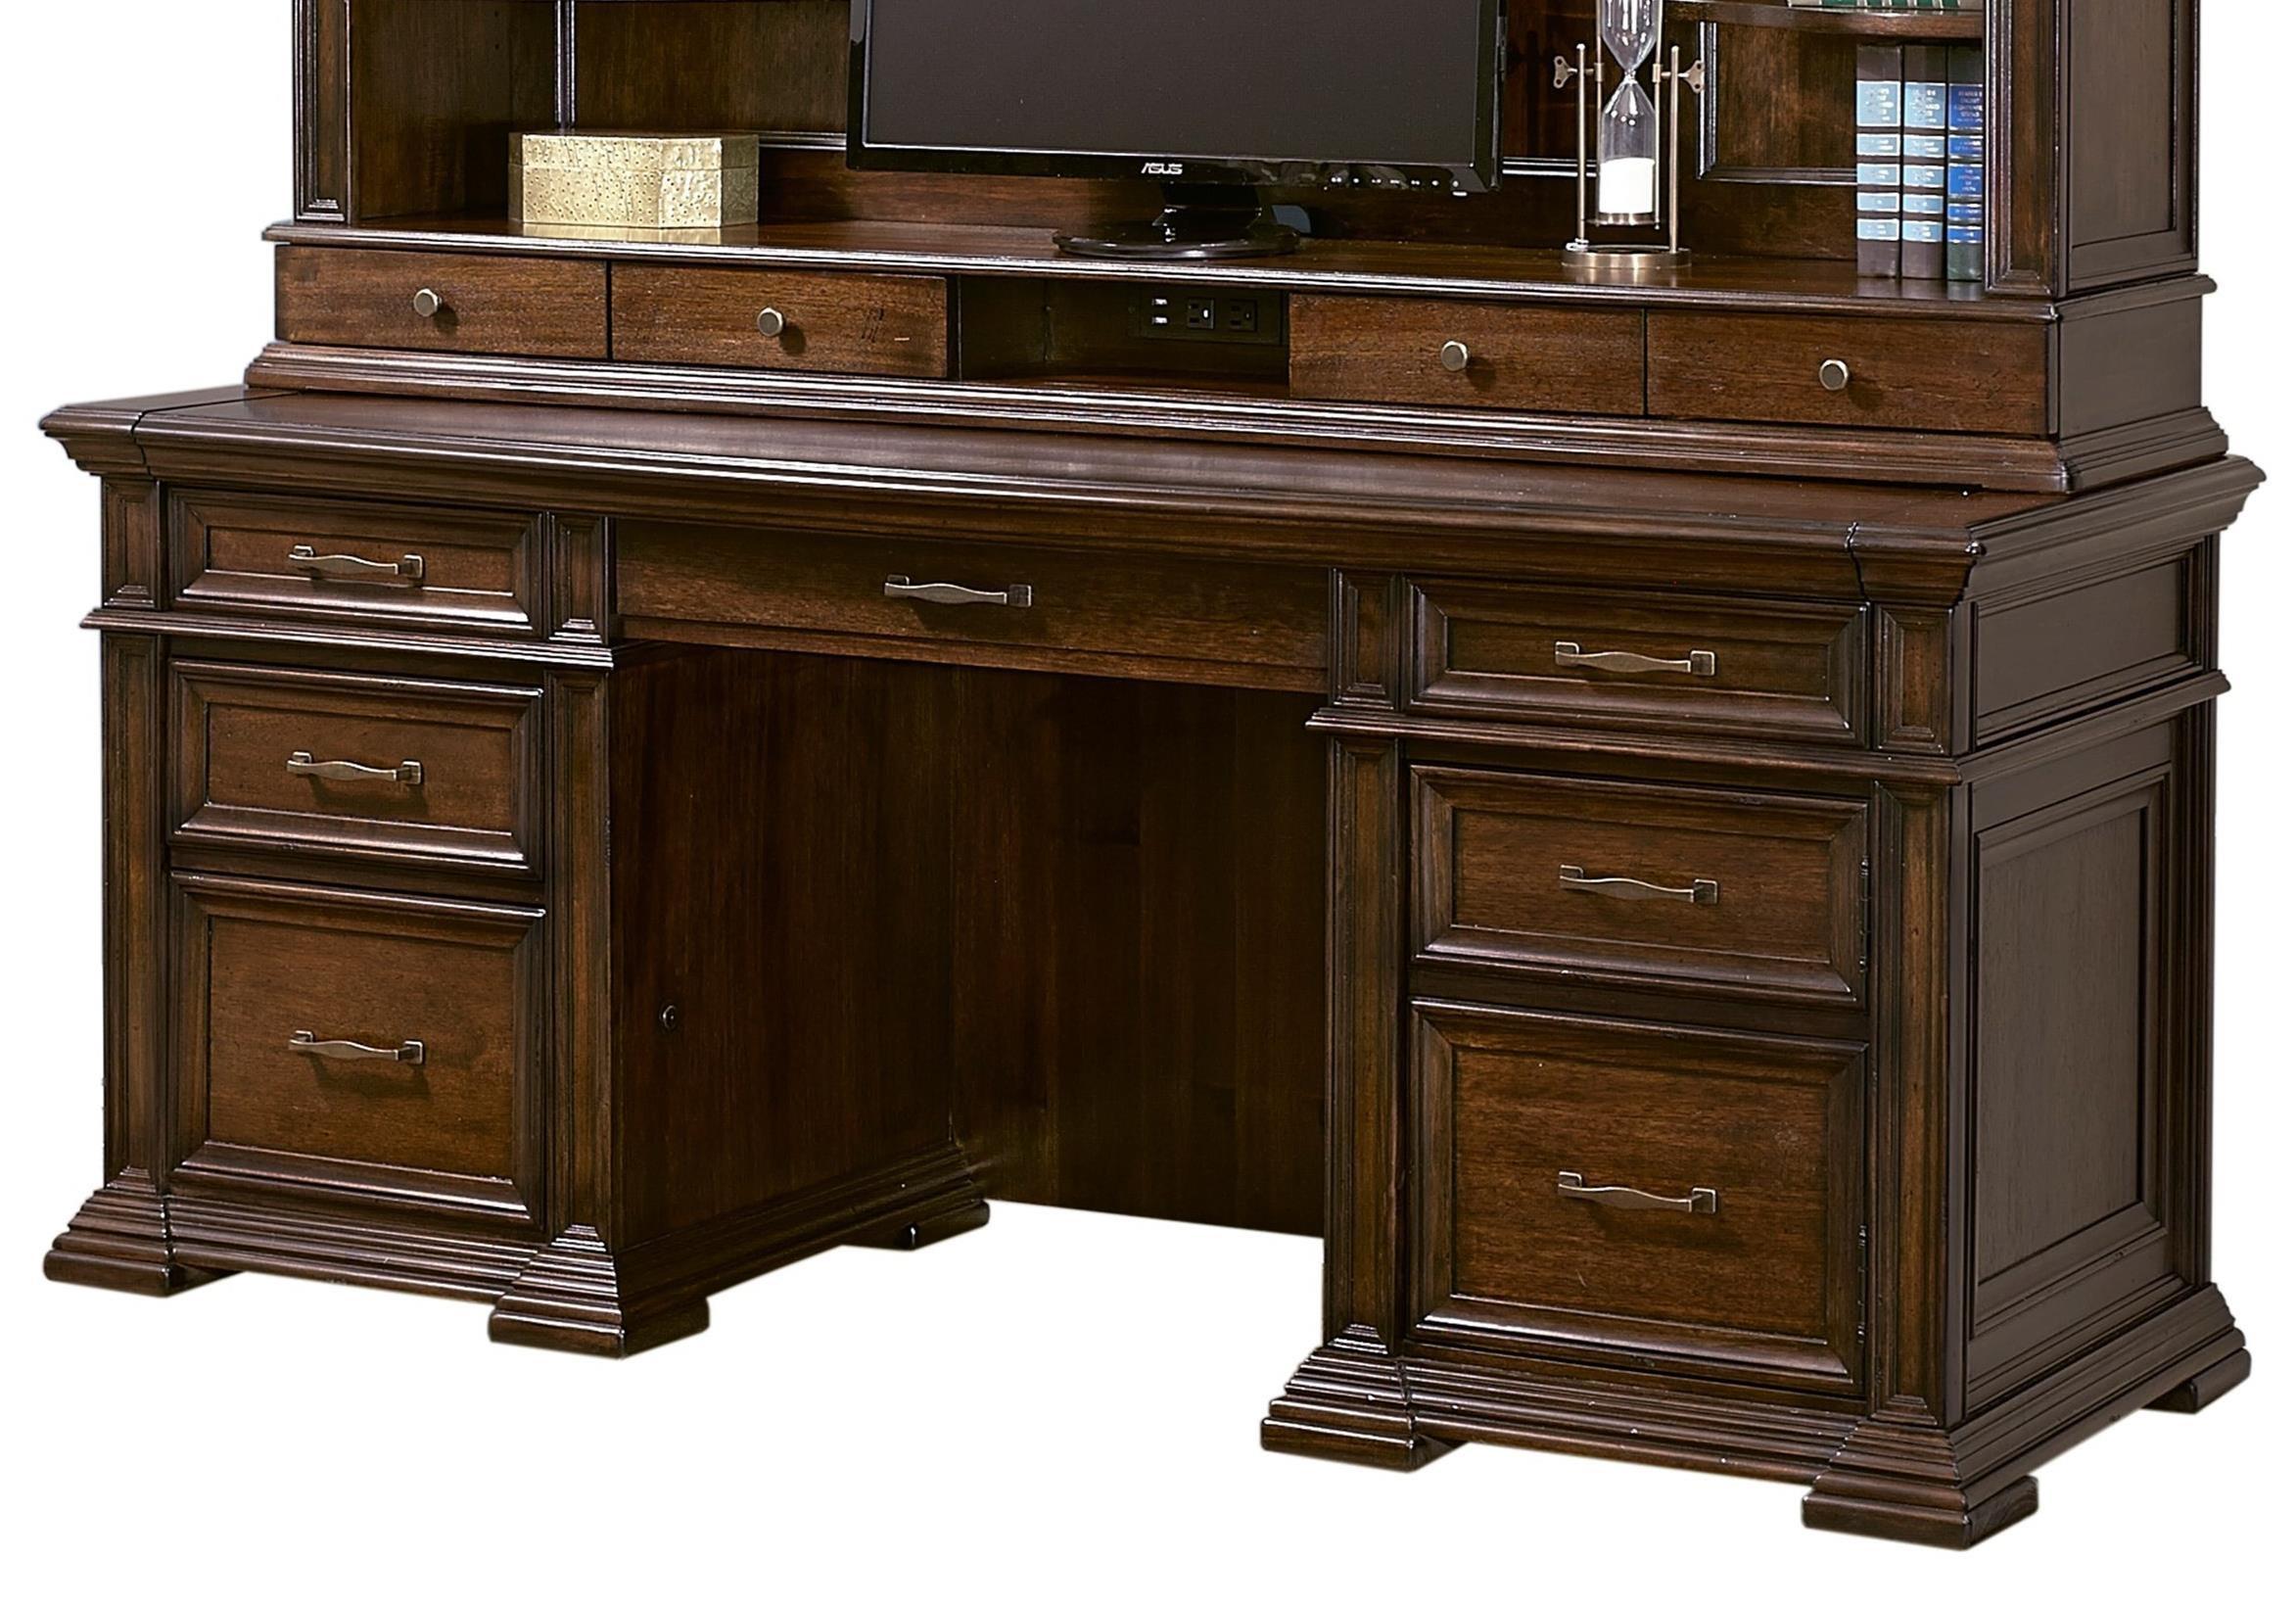 "Grand Classic 74"" Credenza Desk by Aspenhome at Baer's Furniture"